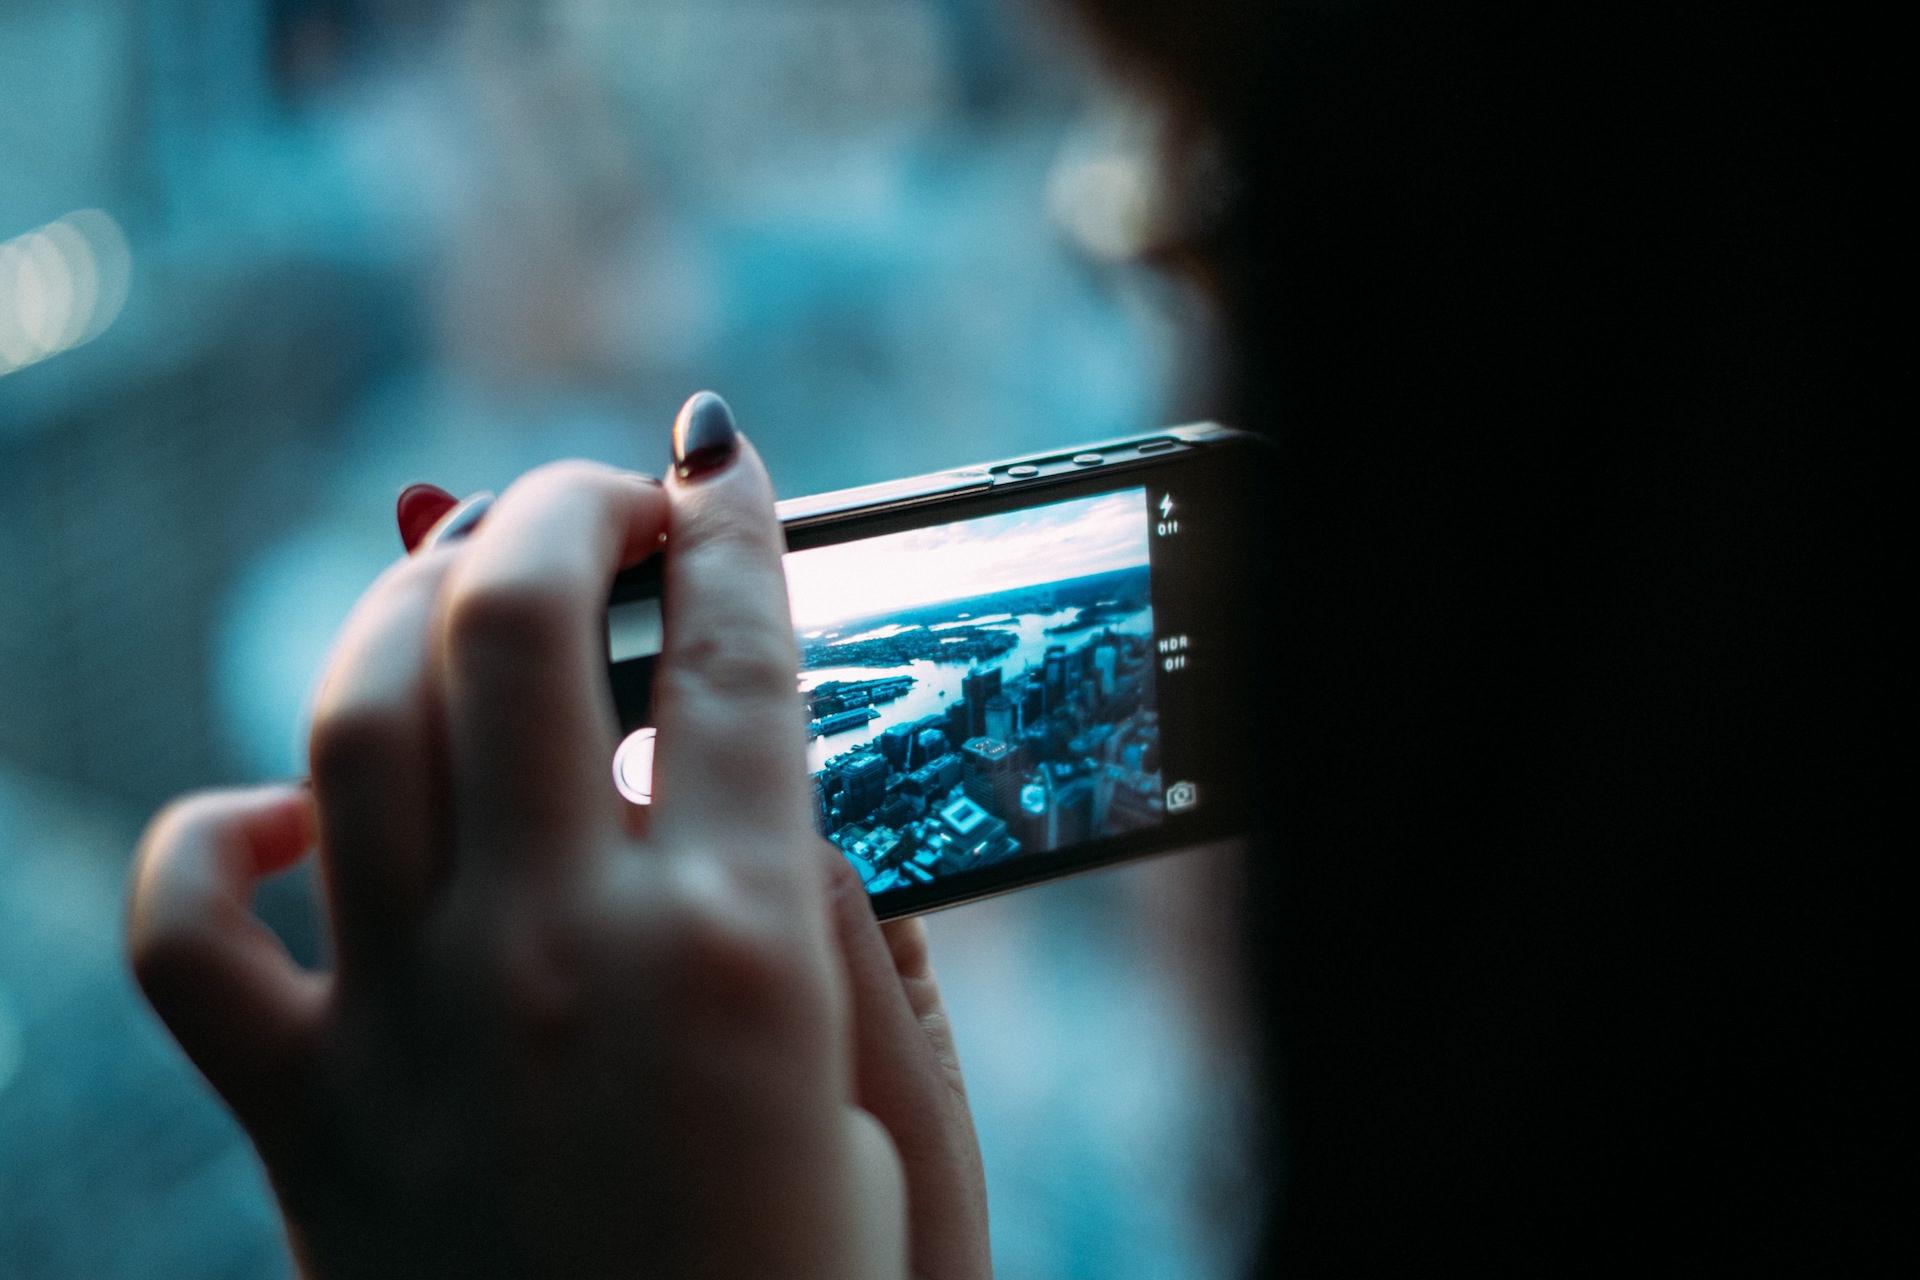 महिला, हाथ, मोबाइल, नाखून, फोटोग्राफी - HD वॉलपेपर - प्रोफेसर-falken.com